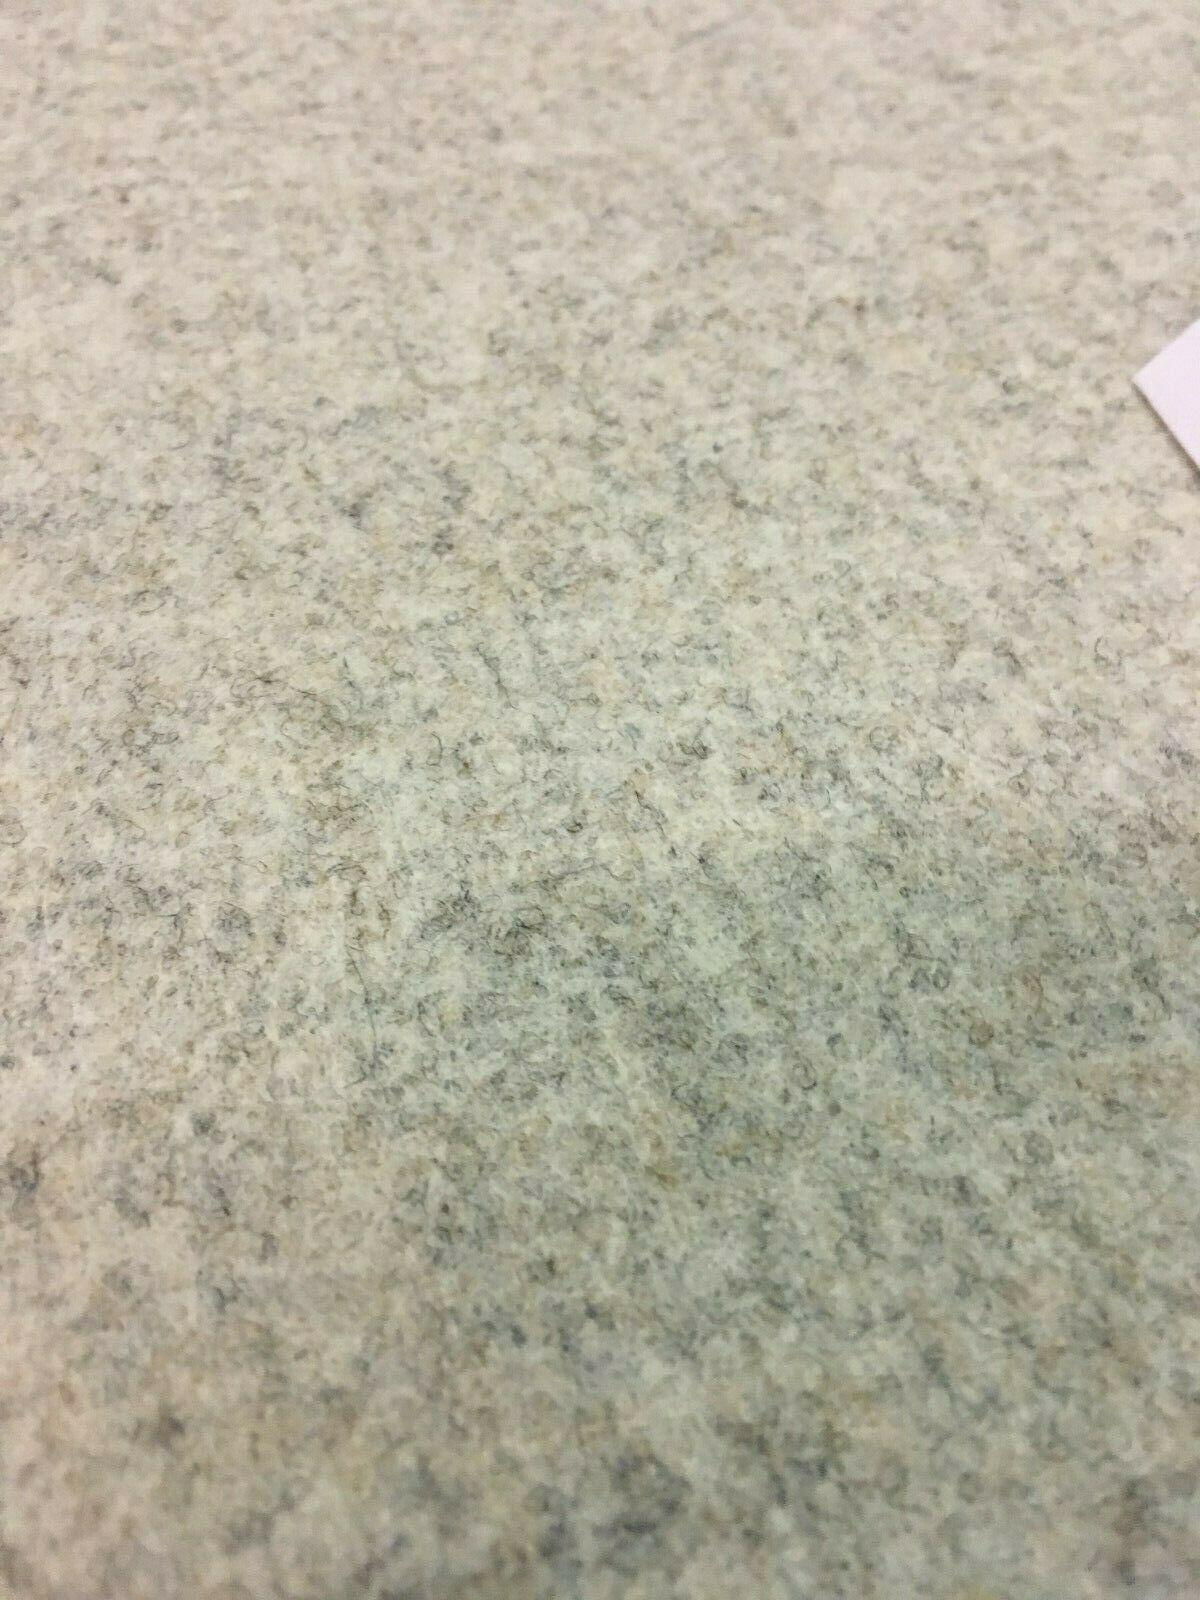 Wool Upholstery Fabric Light Gray Melange 1.25 yards GY